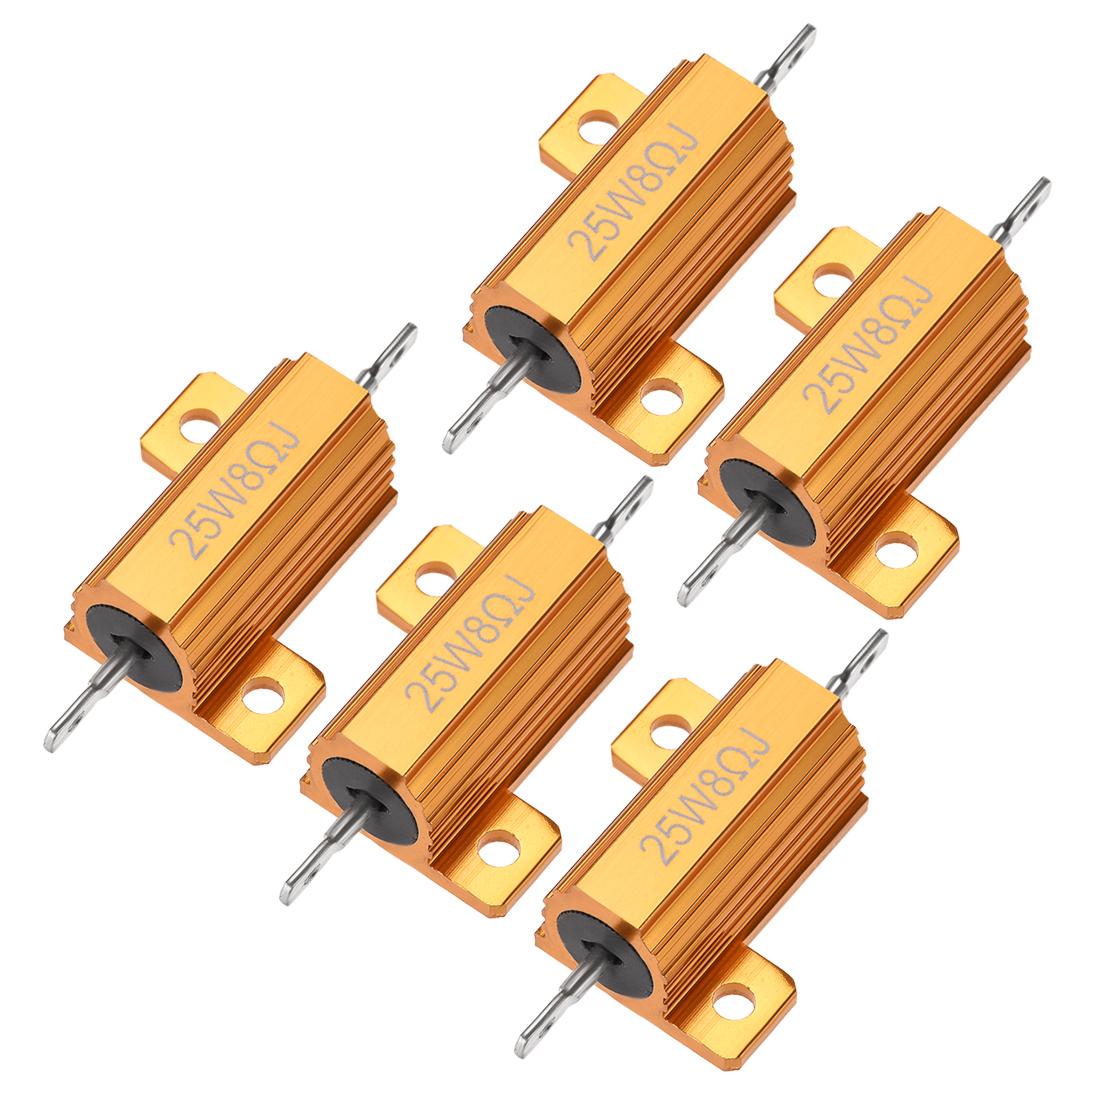 25Watt 8 Ohm 5% Aluminum Housing Resistor Wirewound Resistor Gold Tone 5 Pcs